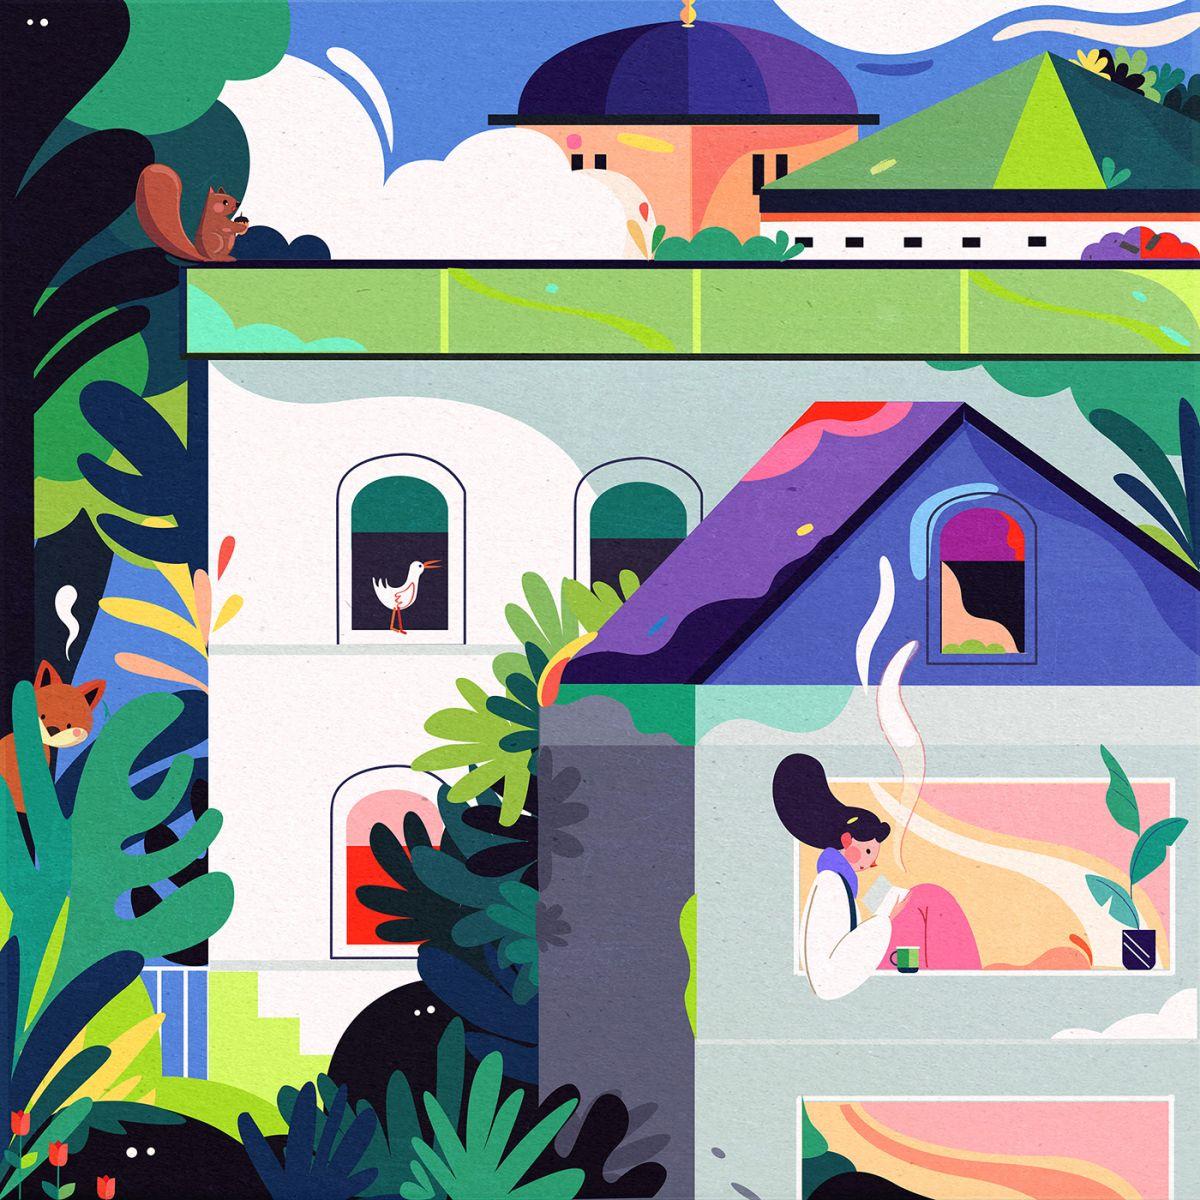 digital illustration corona stay home safe